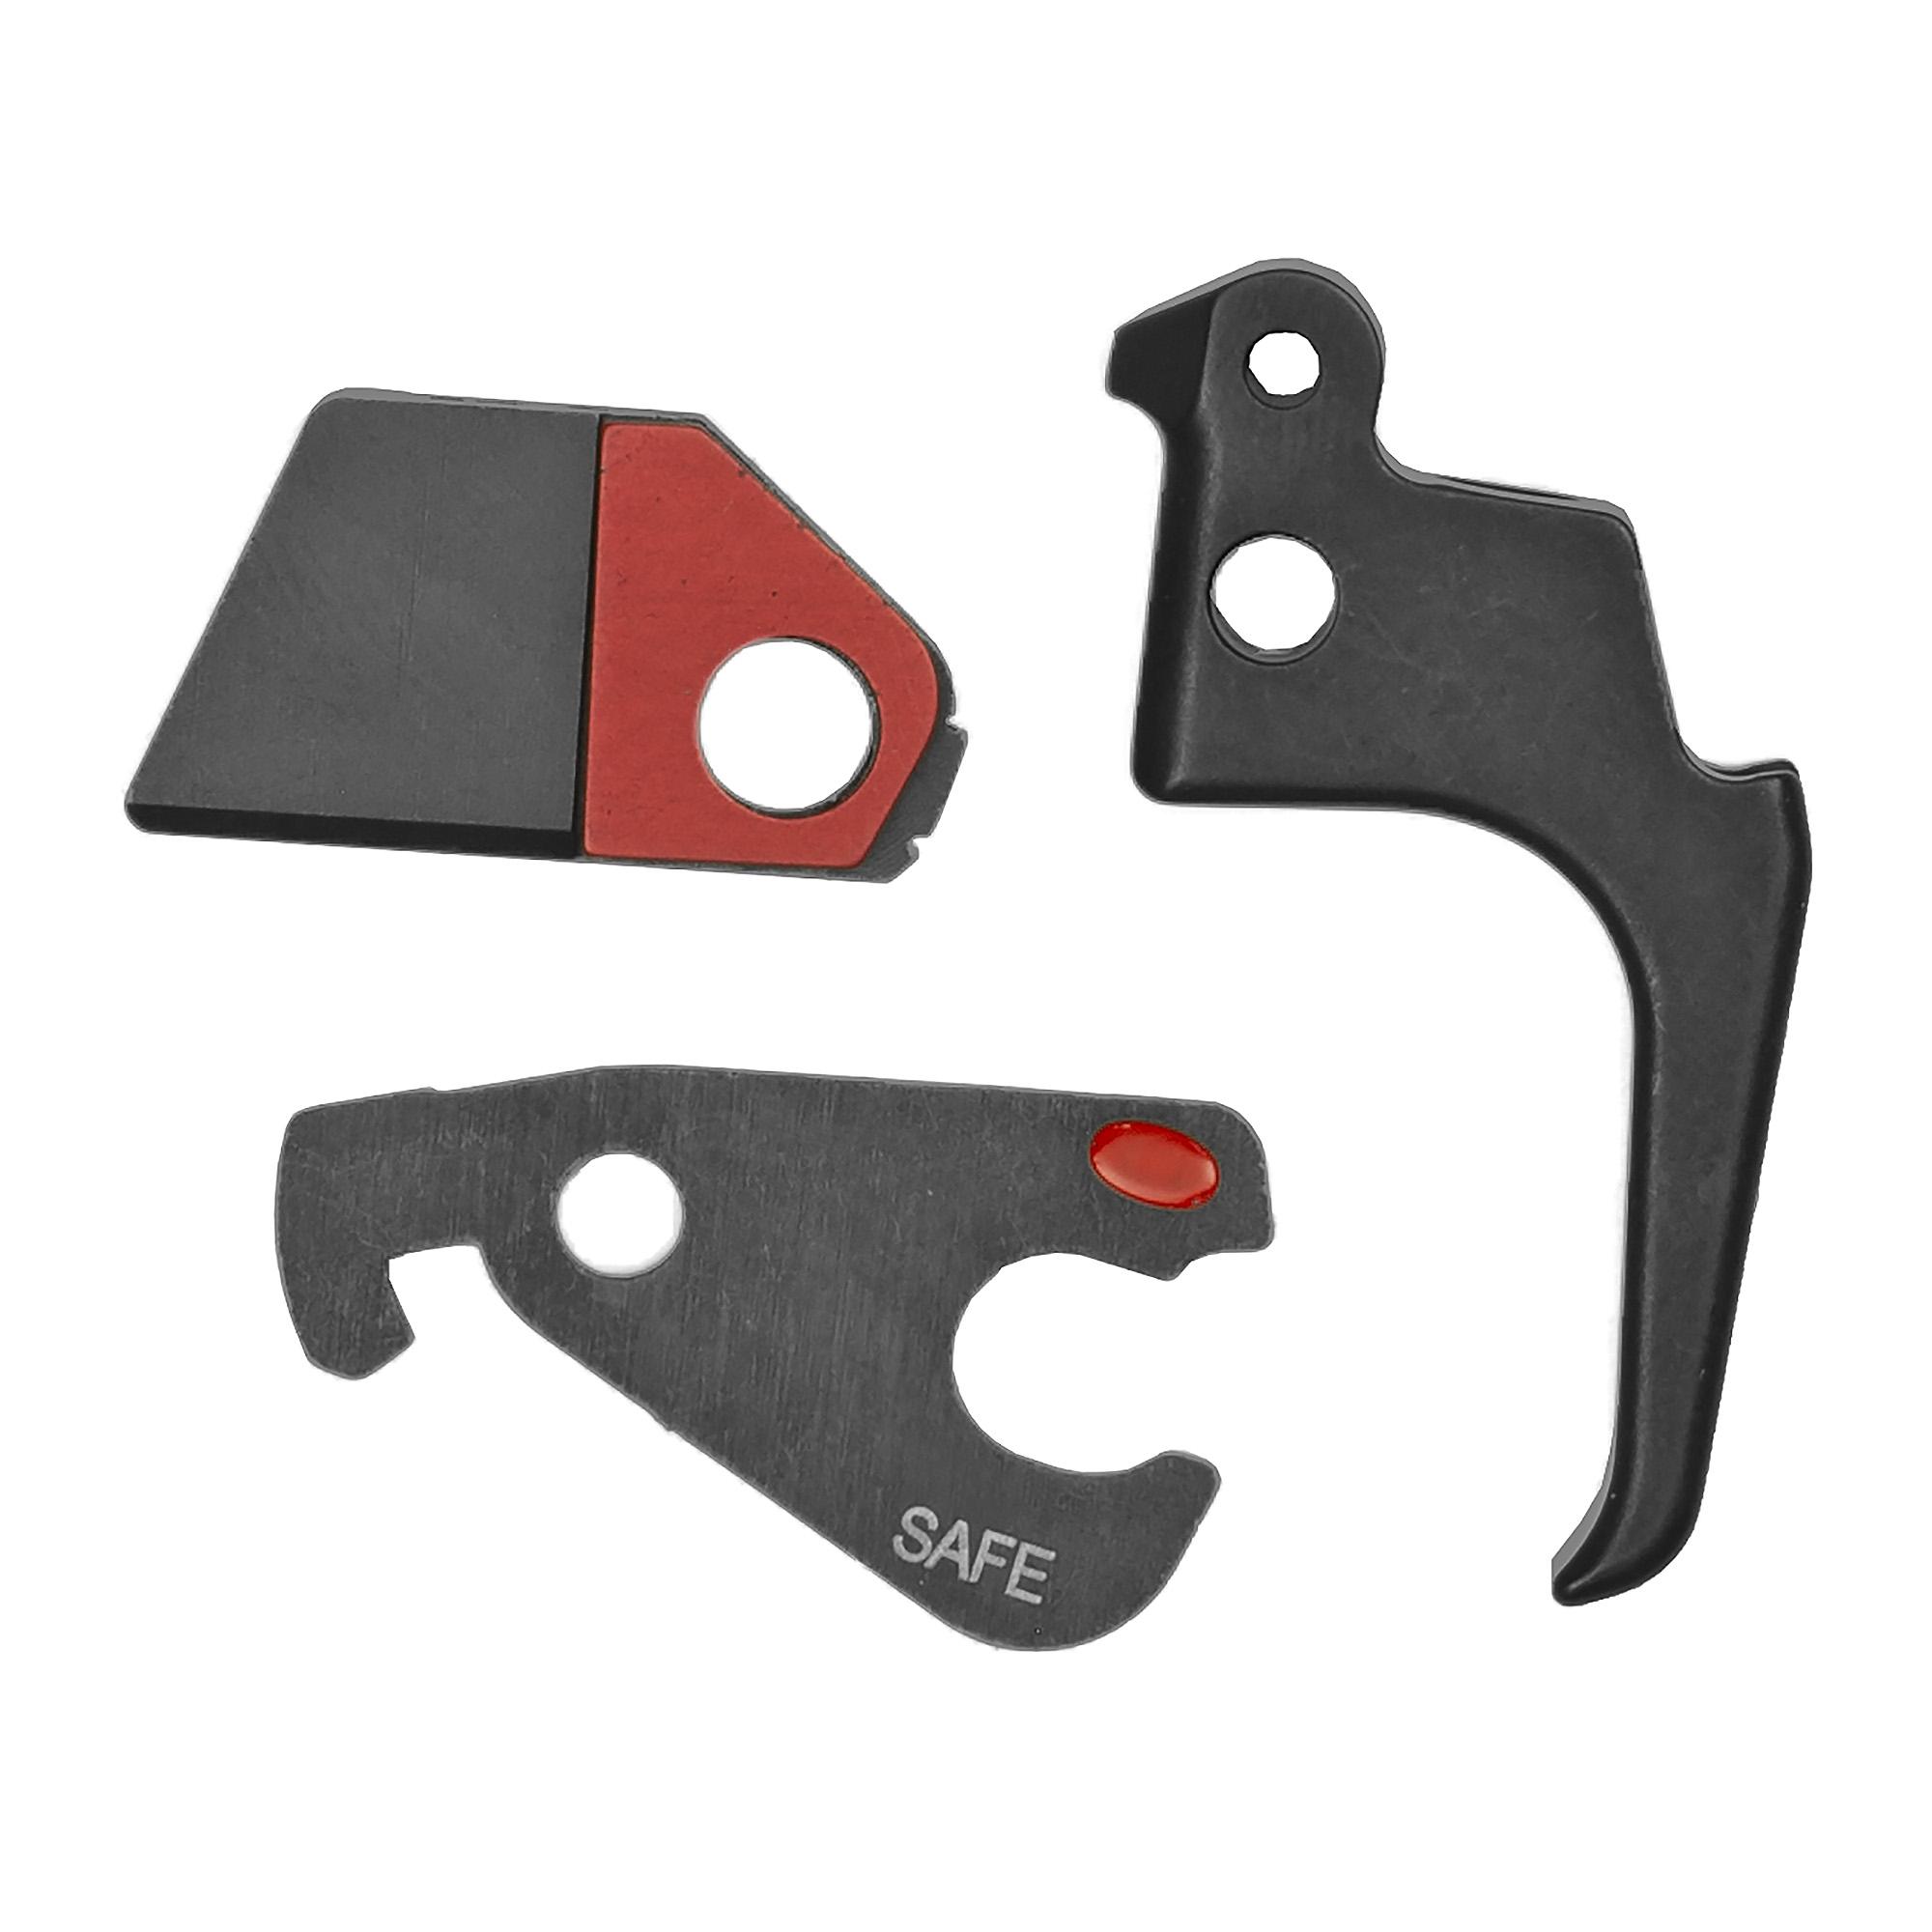 Apex Blk Ae Trigger Kit Rug Mk-iv